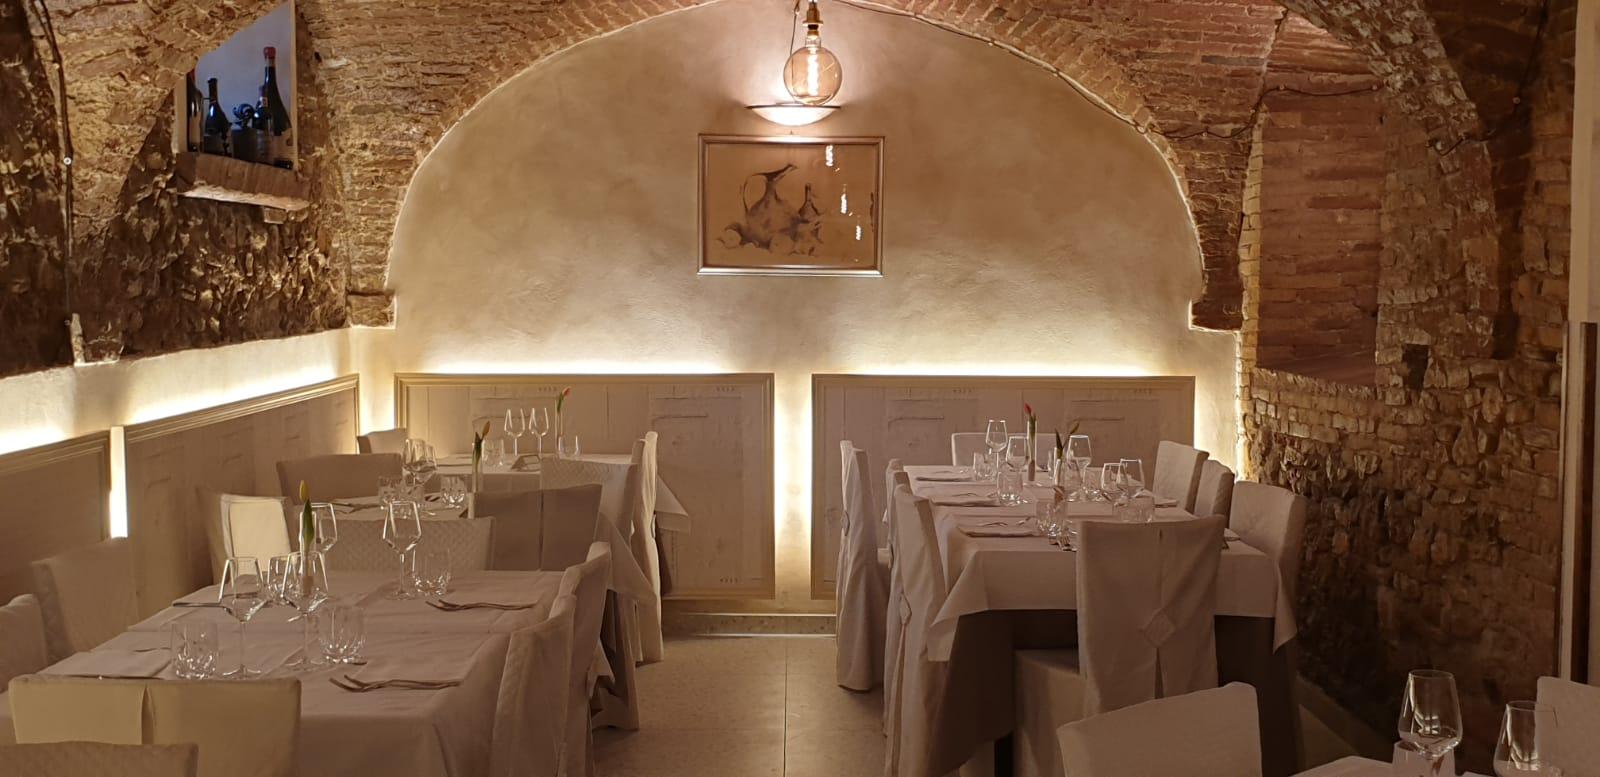 Al Giardino Ancona ristorante giardino ancona - tecnobar